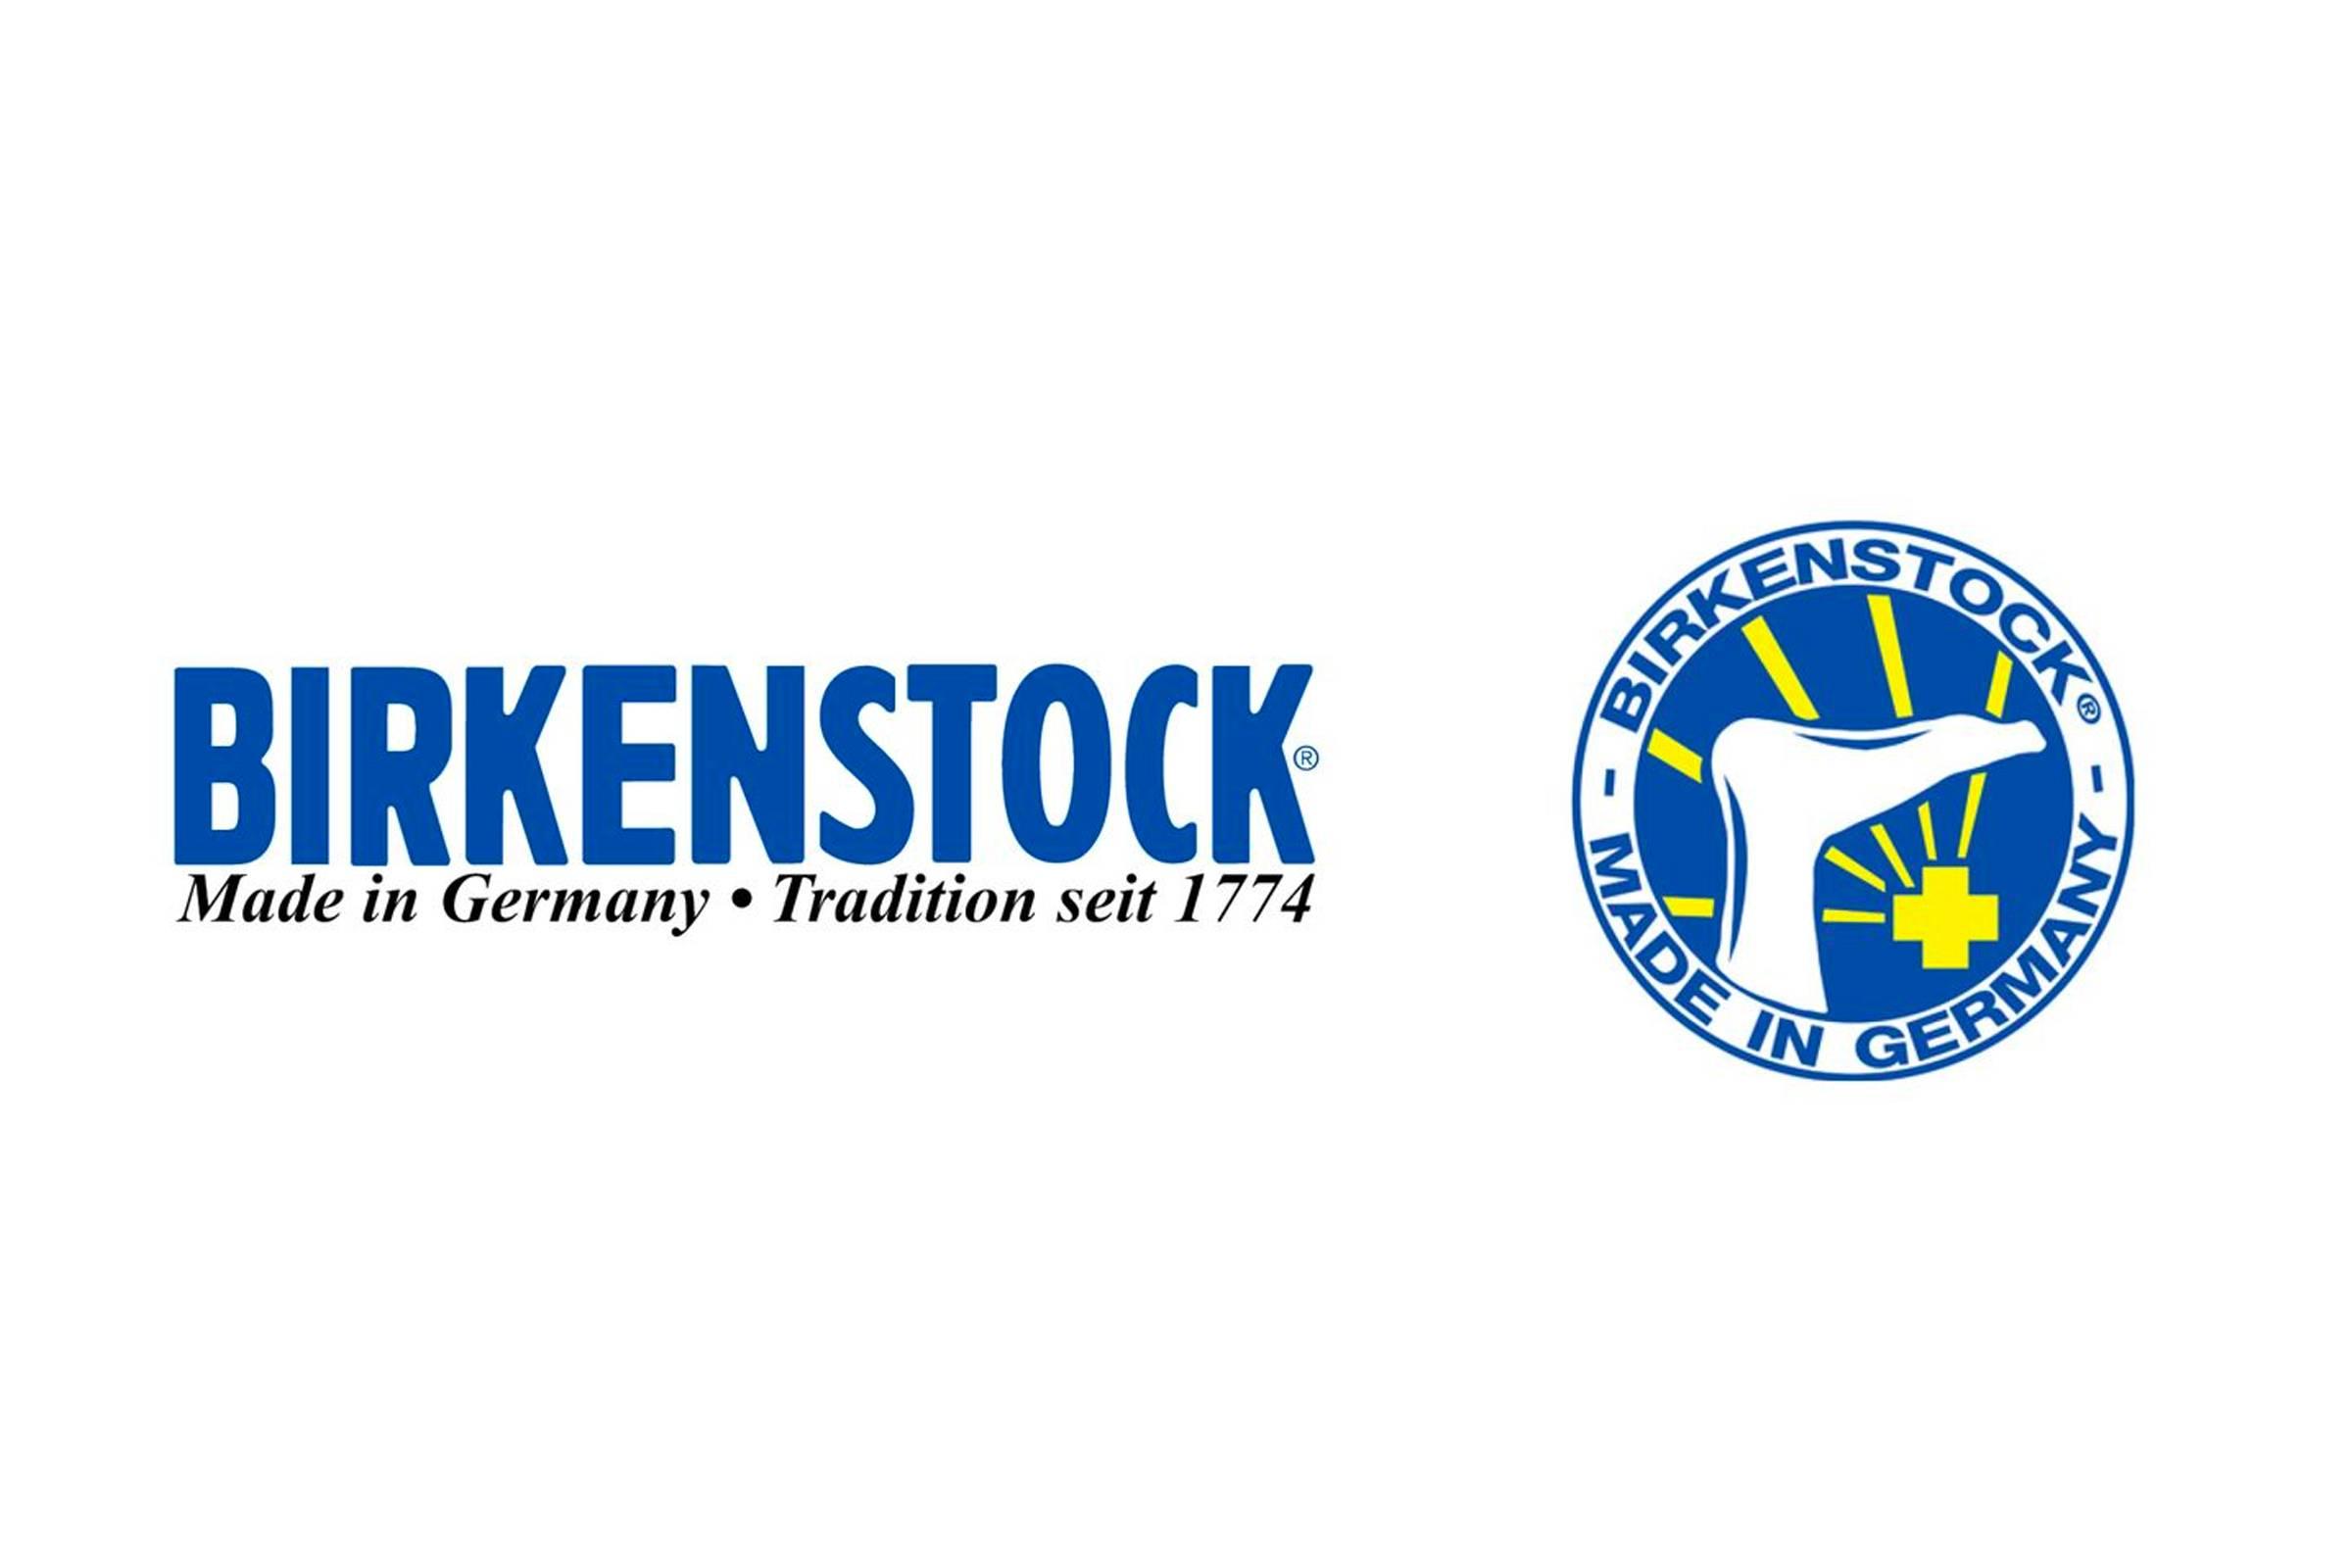 Normcore Fashion Brands: Birkenstock